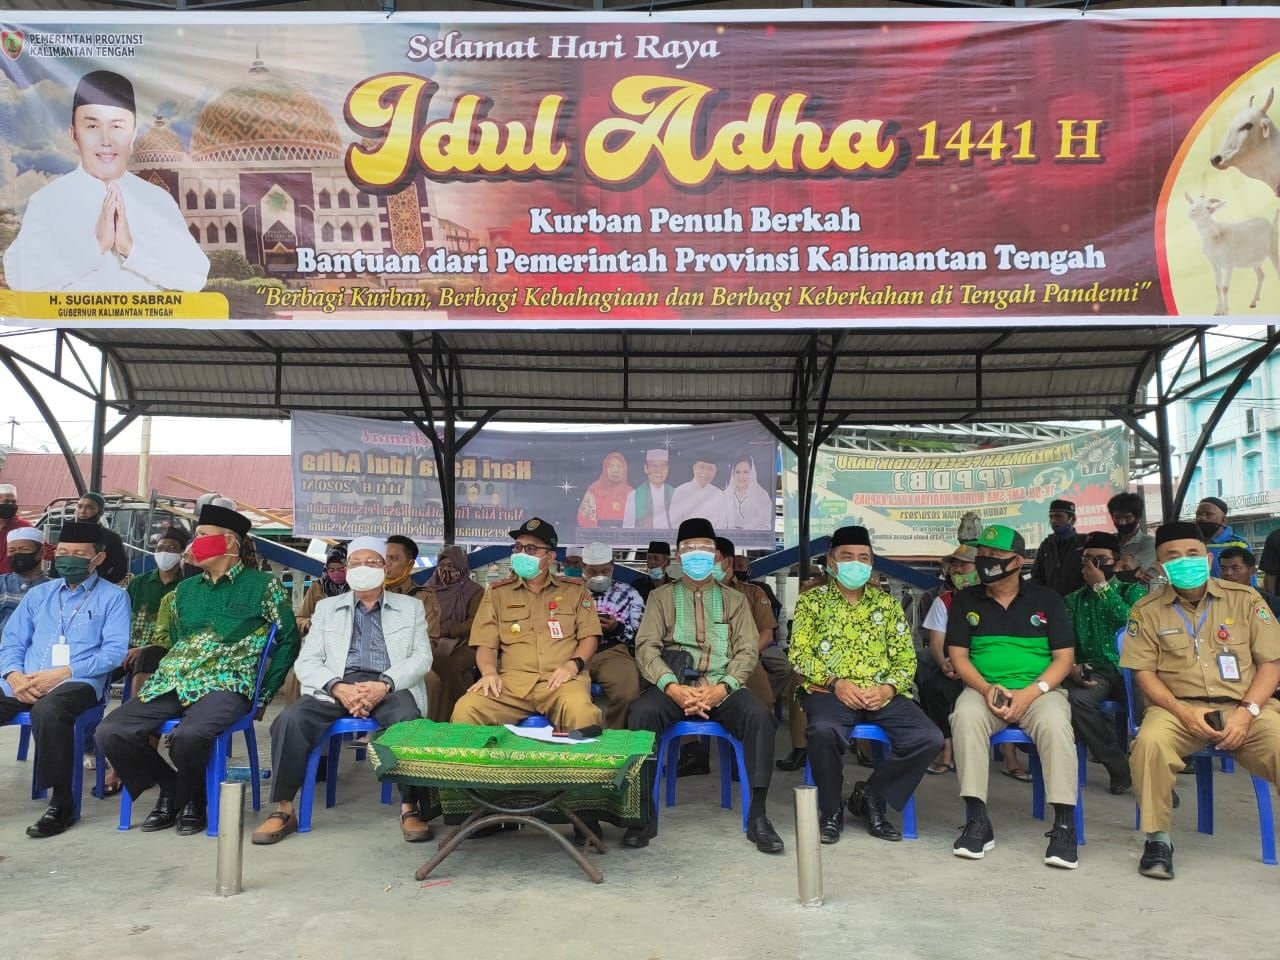 Ketua DPW LDII Kalimantan Tengah Bersama MUI, NU, Dan Muhammadiyah  Menghadiri  Ceremonial Penyerahan Bantuan Kurban Dari Pemerintah Prov. Kalteng